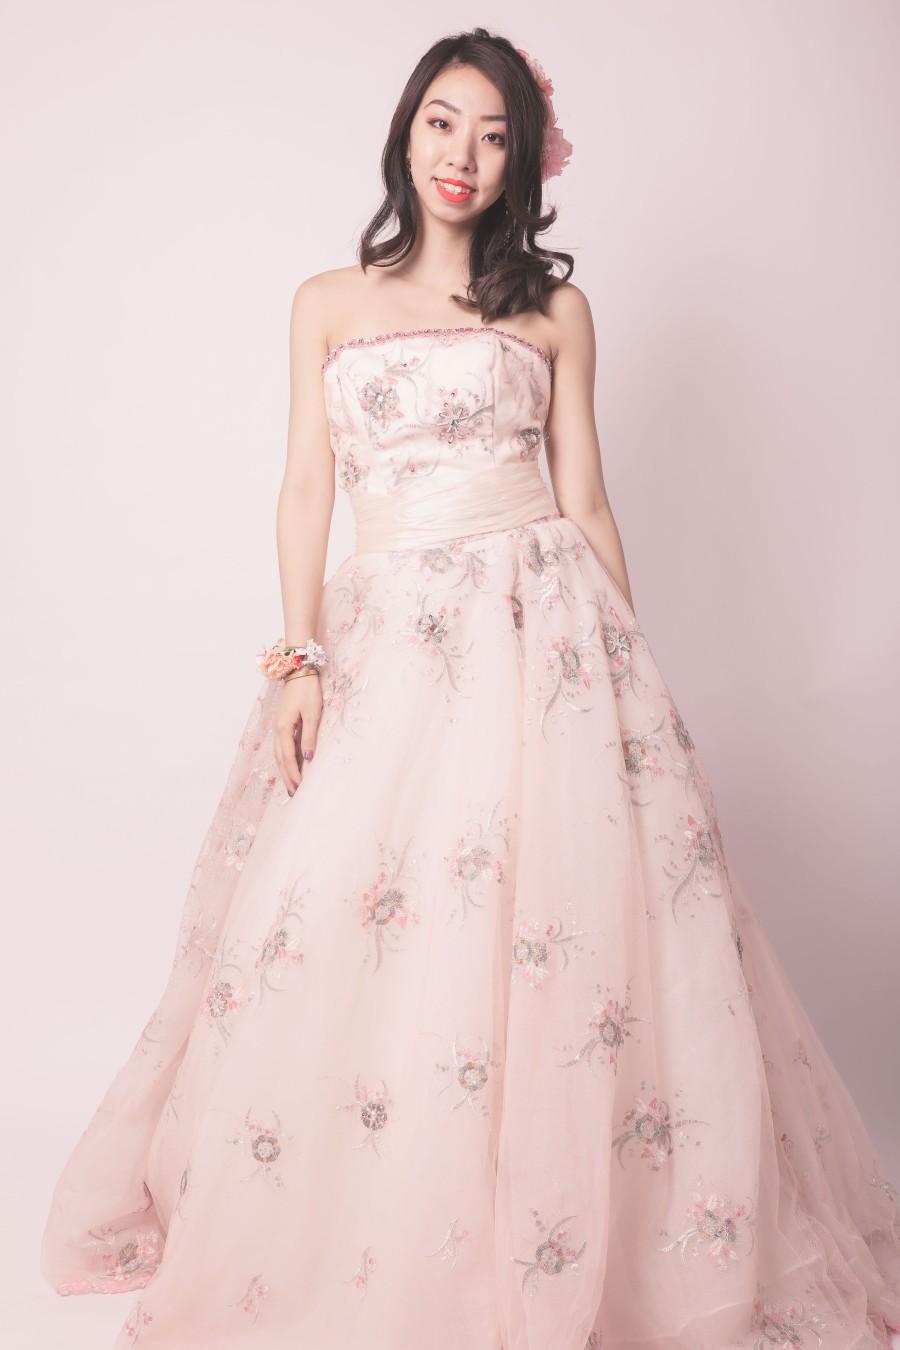 韓式新娘化妝髮型攝影_bridal_wedding_Korea_makeup_hairstyling_Top_MUA_paulstylist_photography_hk-60